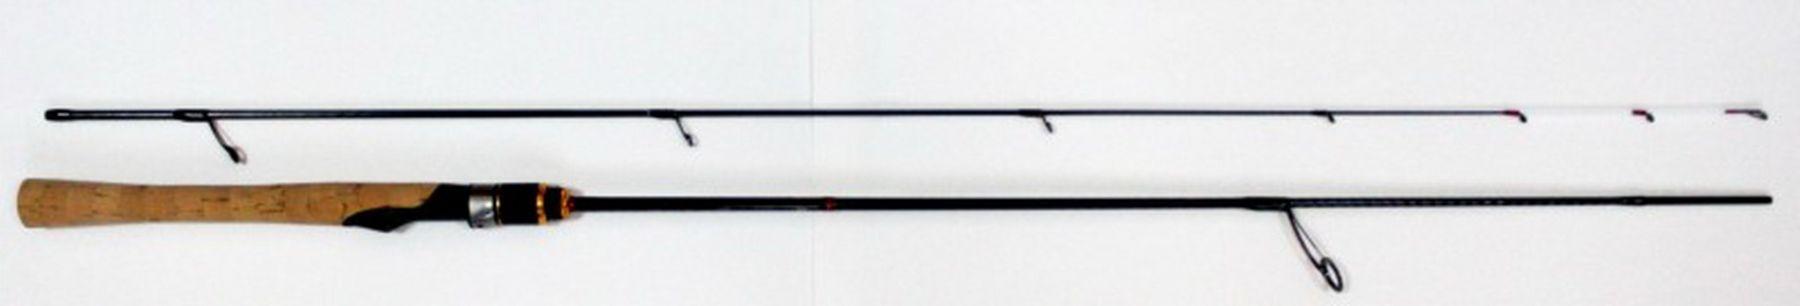 Cпиннинг Mifine Camara Jig Spin 1.95 м / 0.5-8г / арт 11317-195